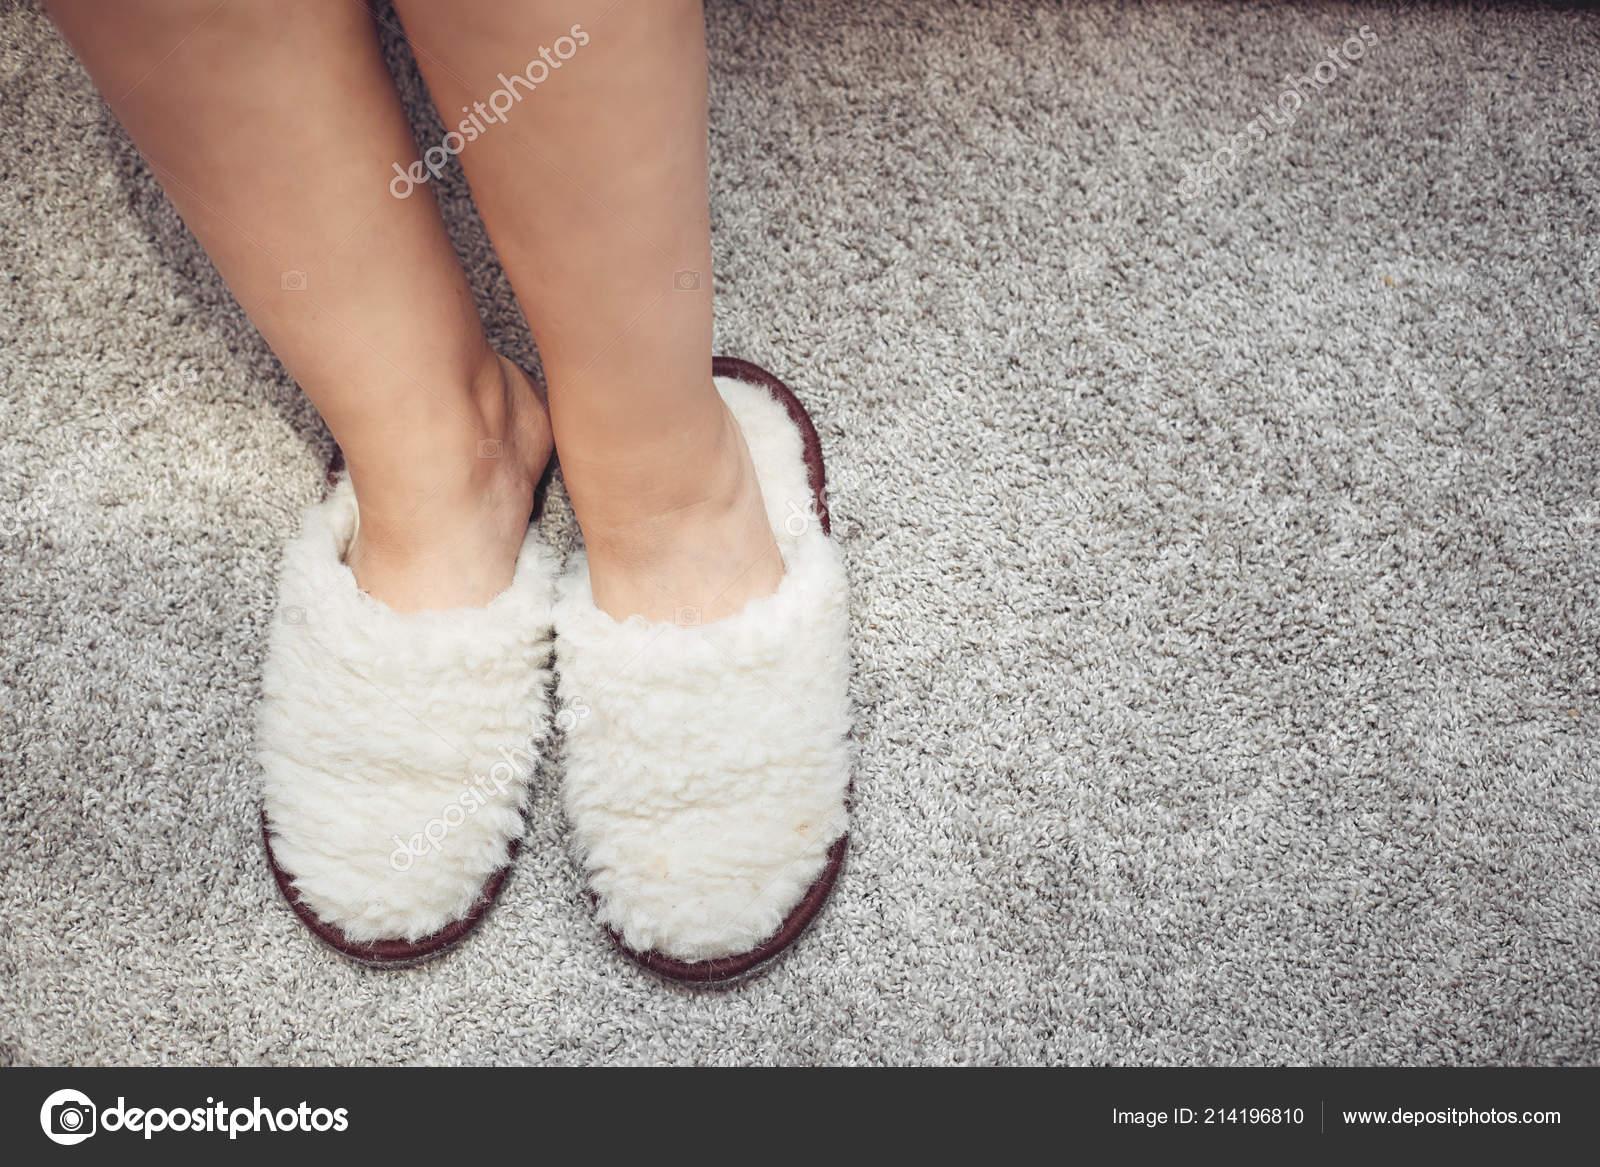 e61bf10dc98ba Womens feet in fur Slippers on a warm carpet. — Stock Photo © vadiar ...